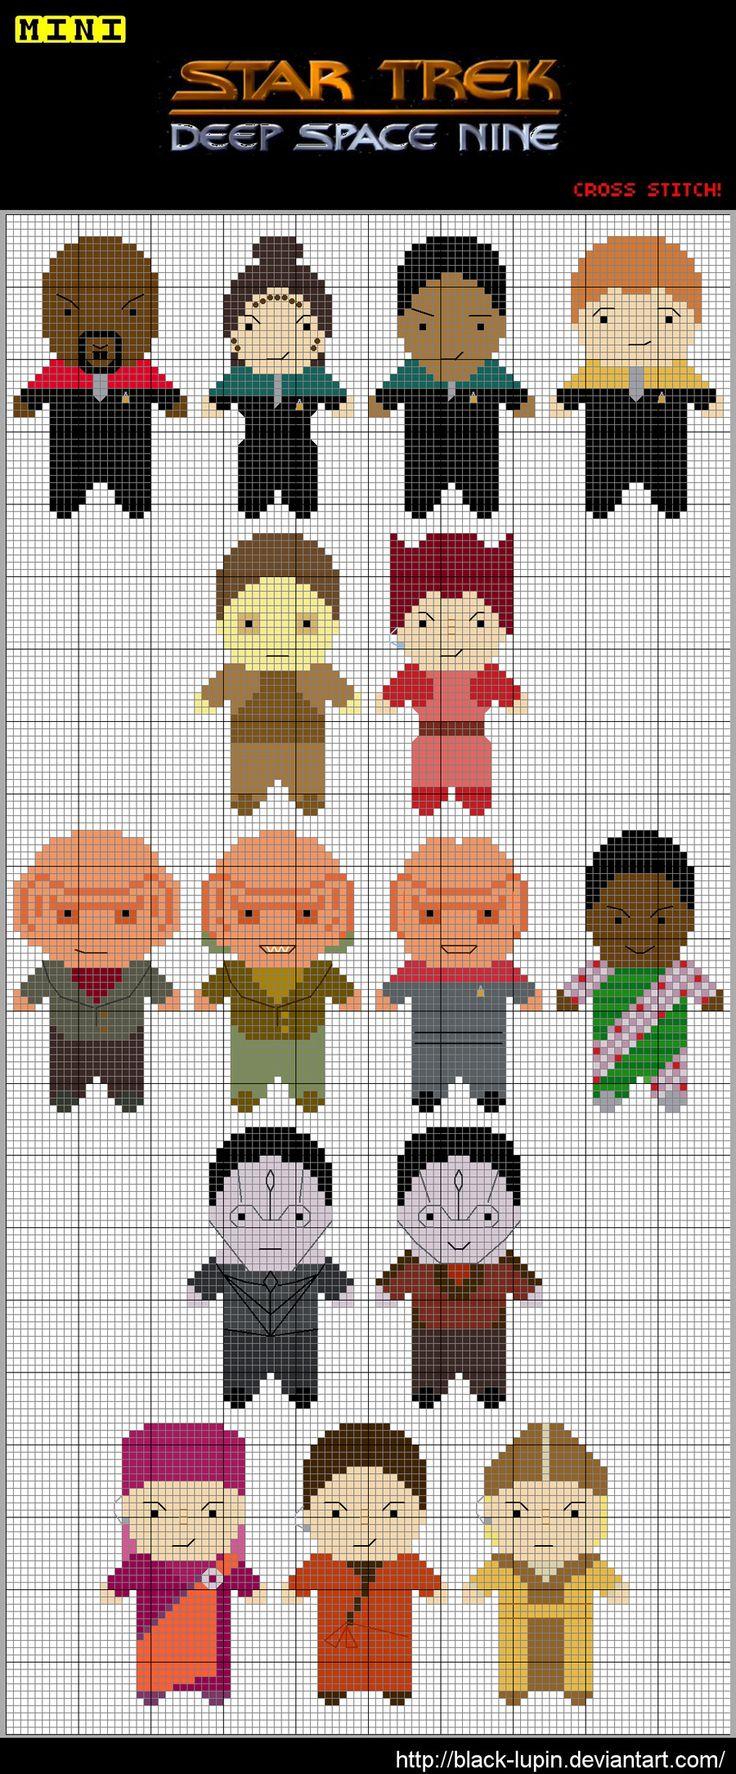 Star Trek DS9 Cross Stitch by *black-lupin on deviantART